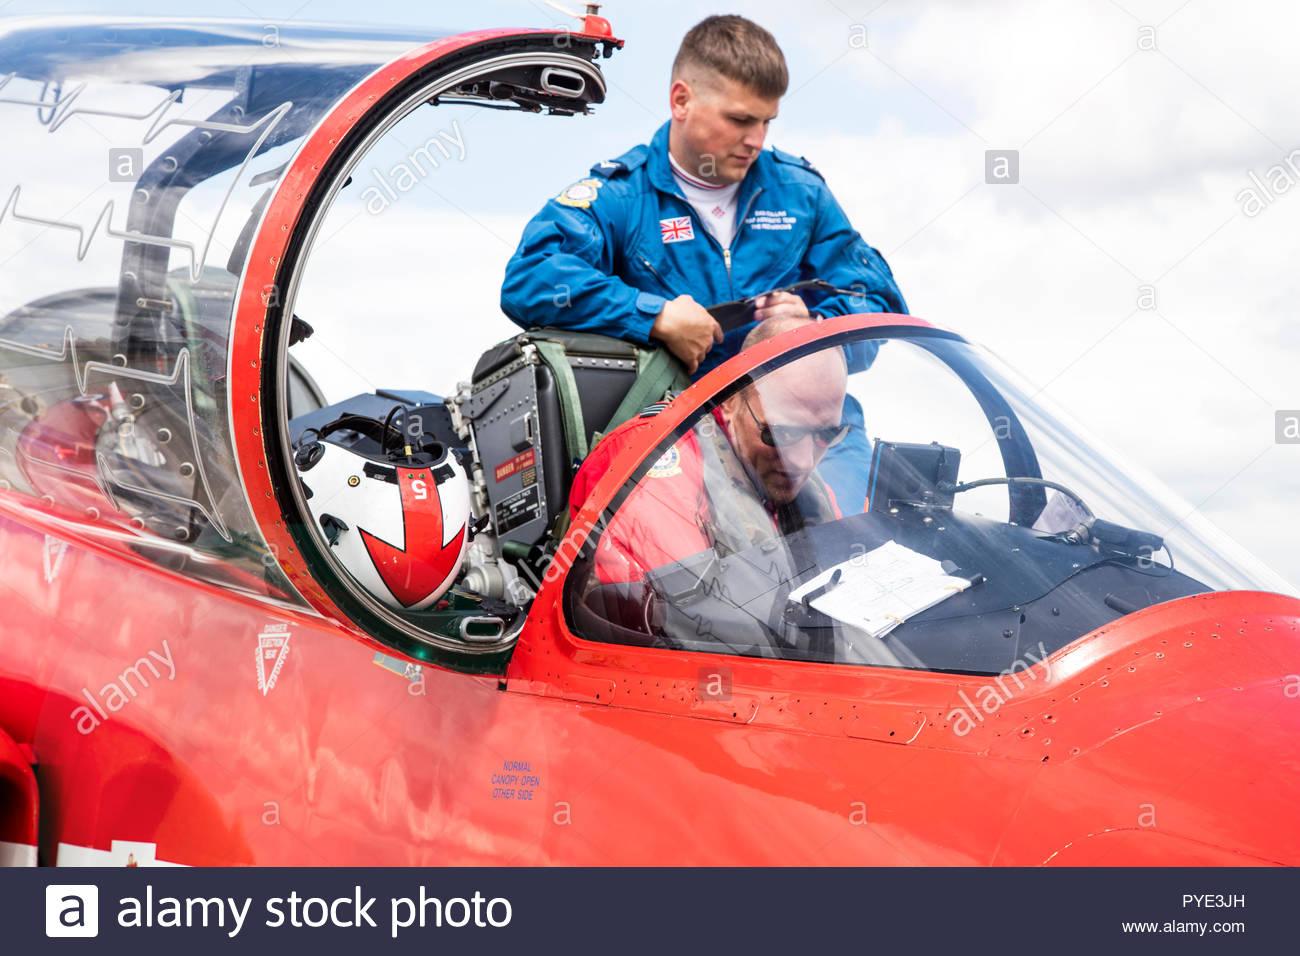 Red Arrows pilots in cockpit on RAF Scrampton, UK - Stock Image